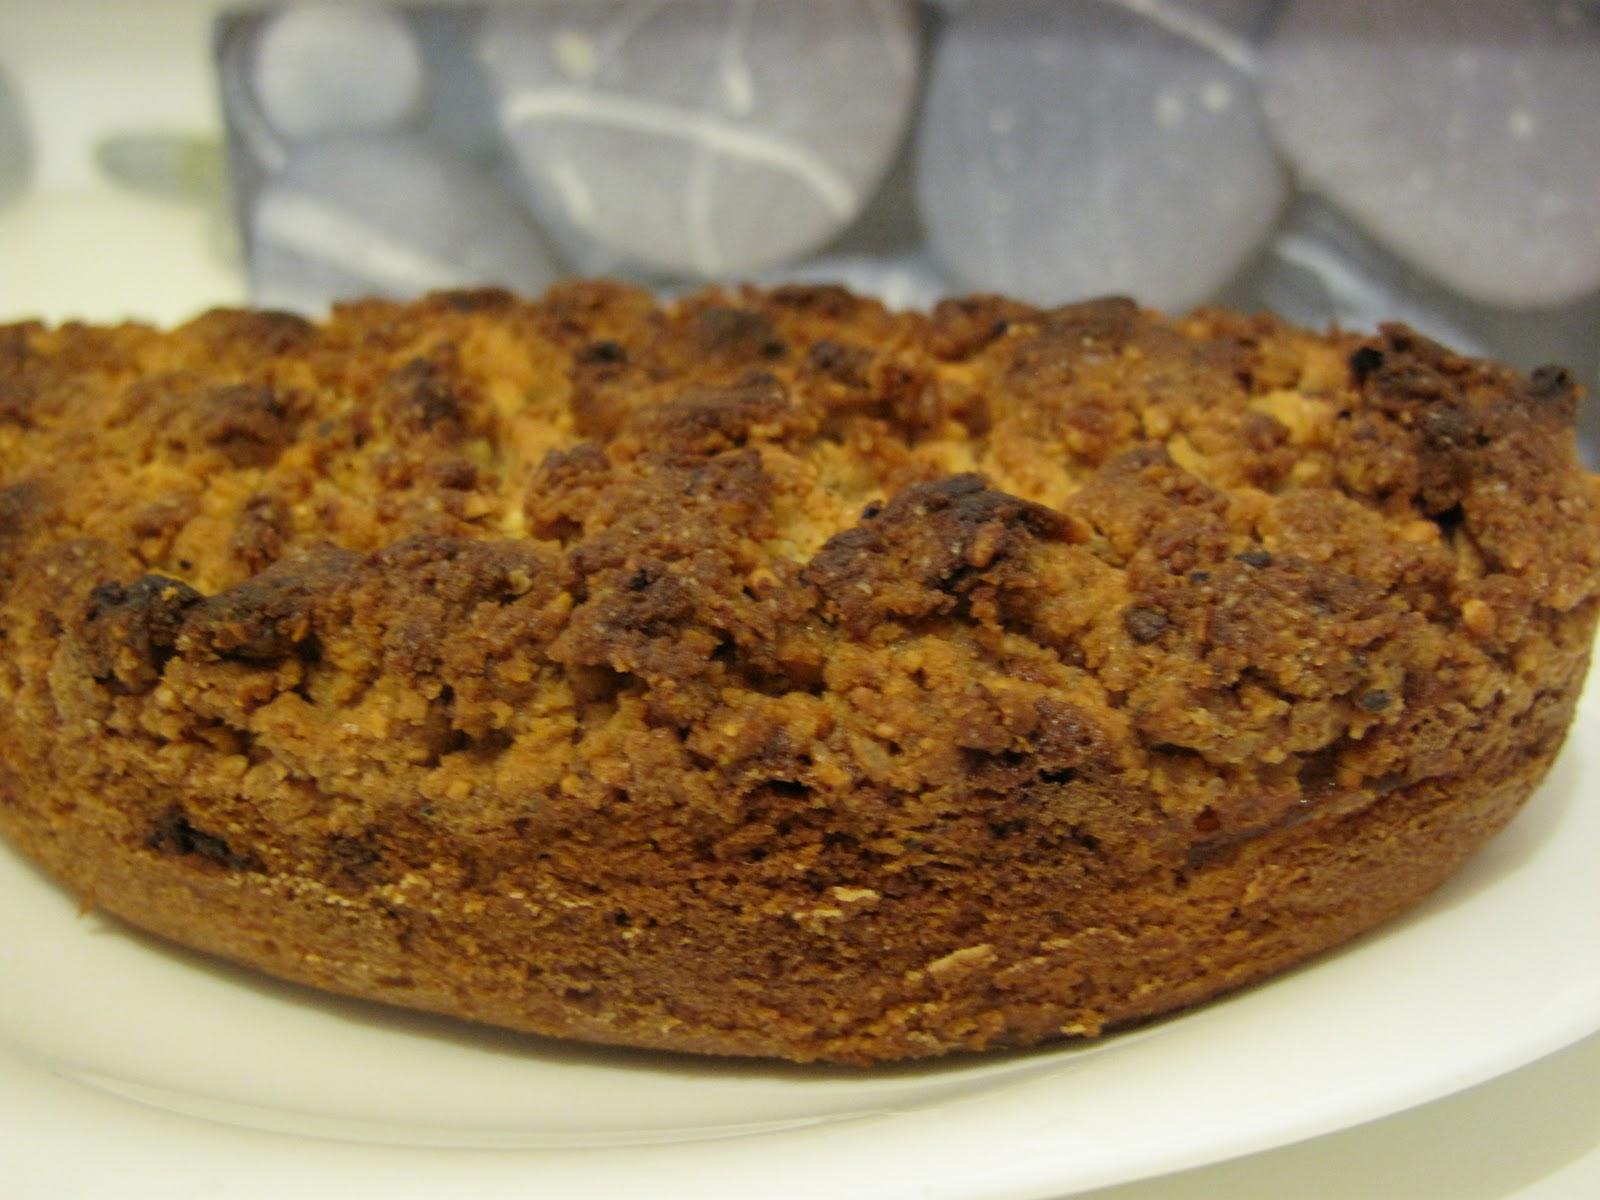 gourmandises homecooked dessert cake crumble aux pommes noisettes et chocolat